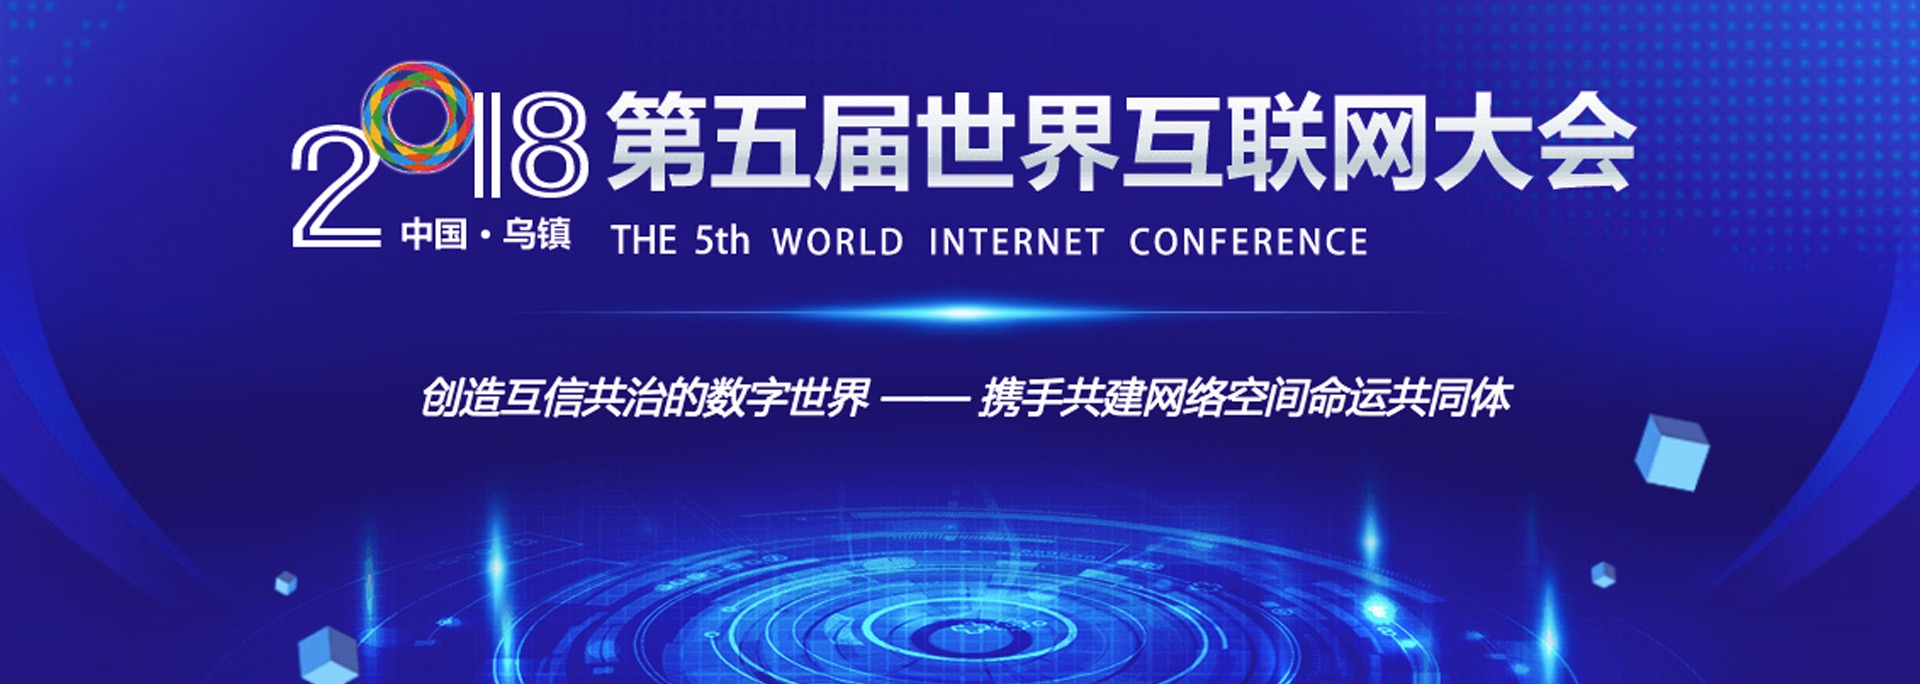 Tongdun Technology Has Launched Another Strategic Platform: The Intelligent Voice Service Platform Hertz